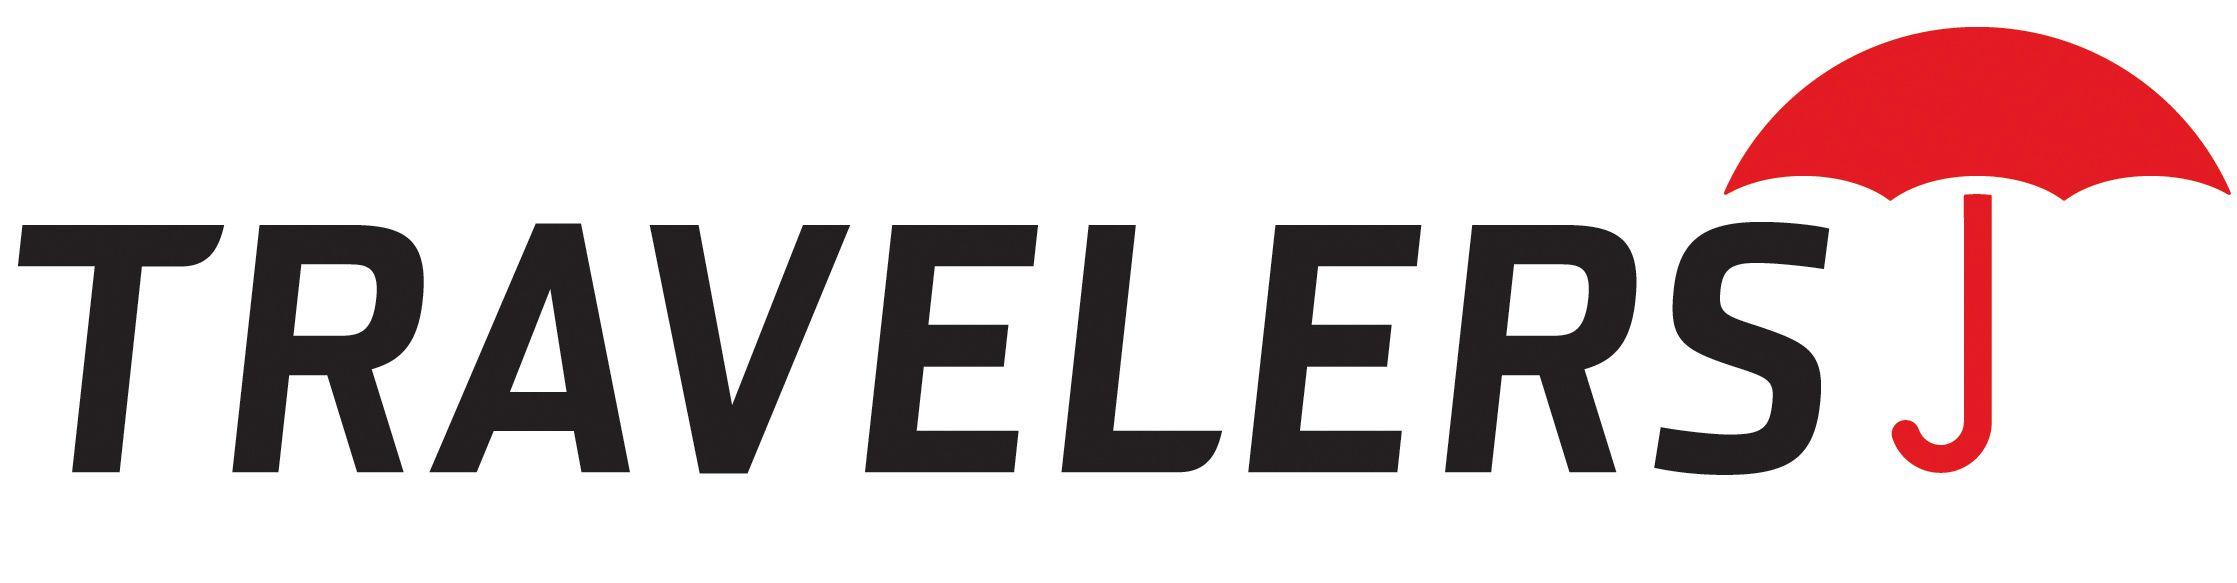 Travelers Ins logo